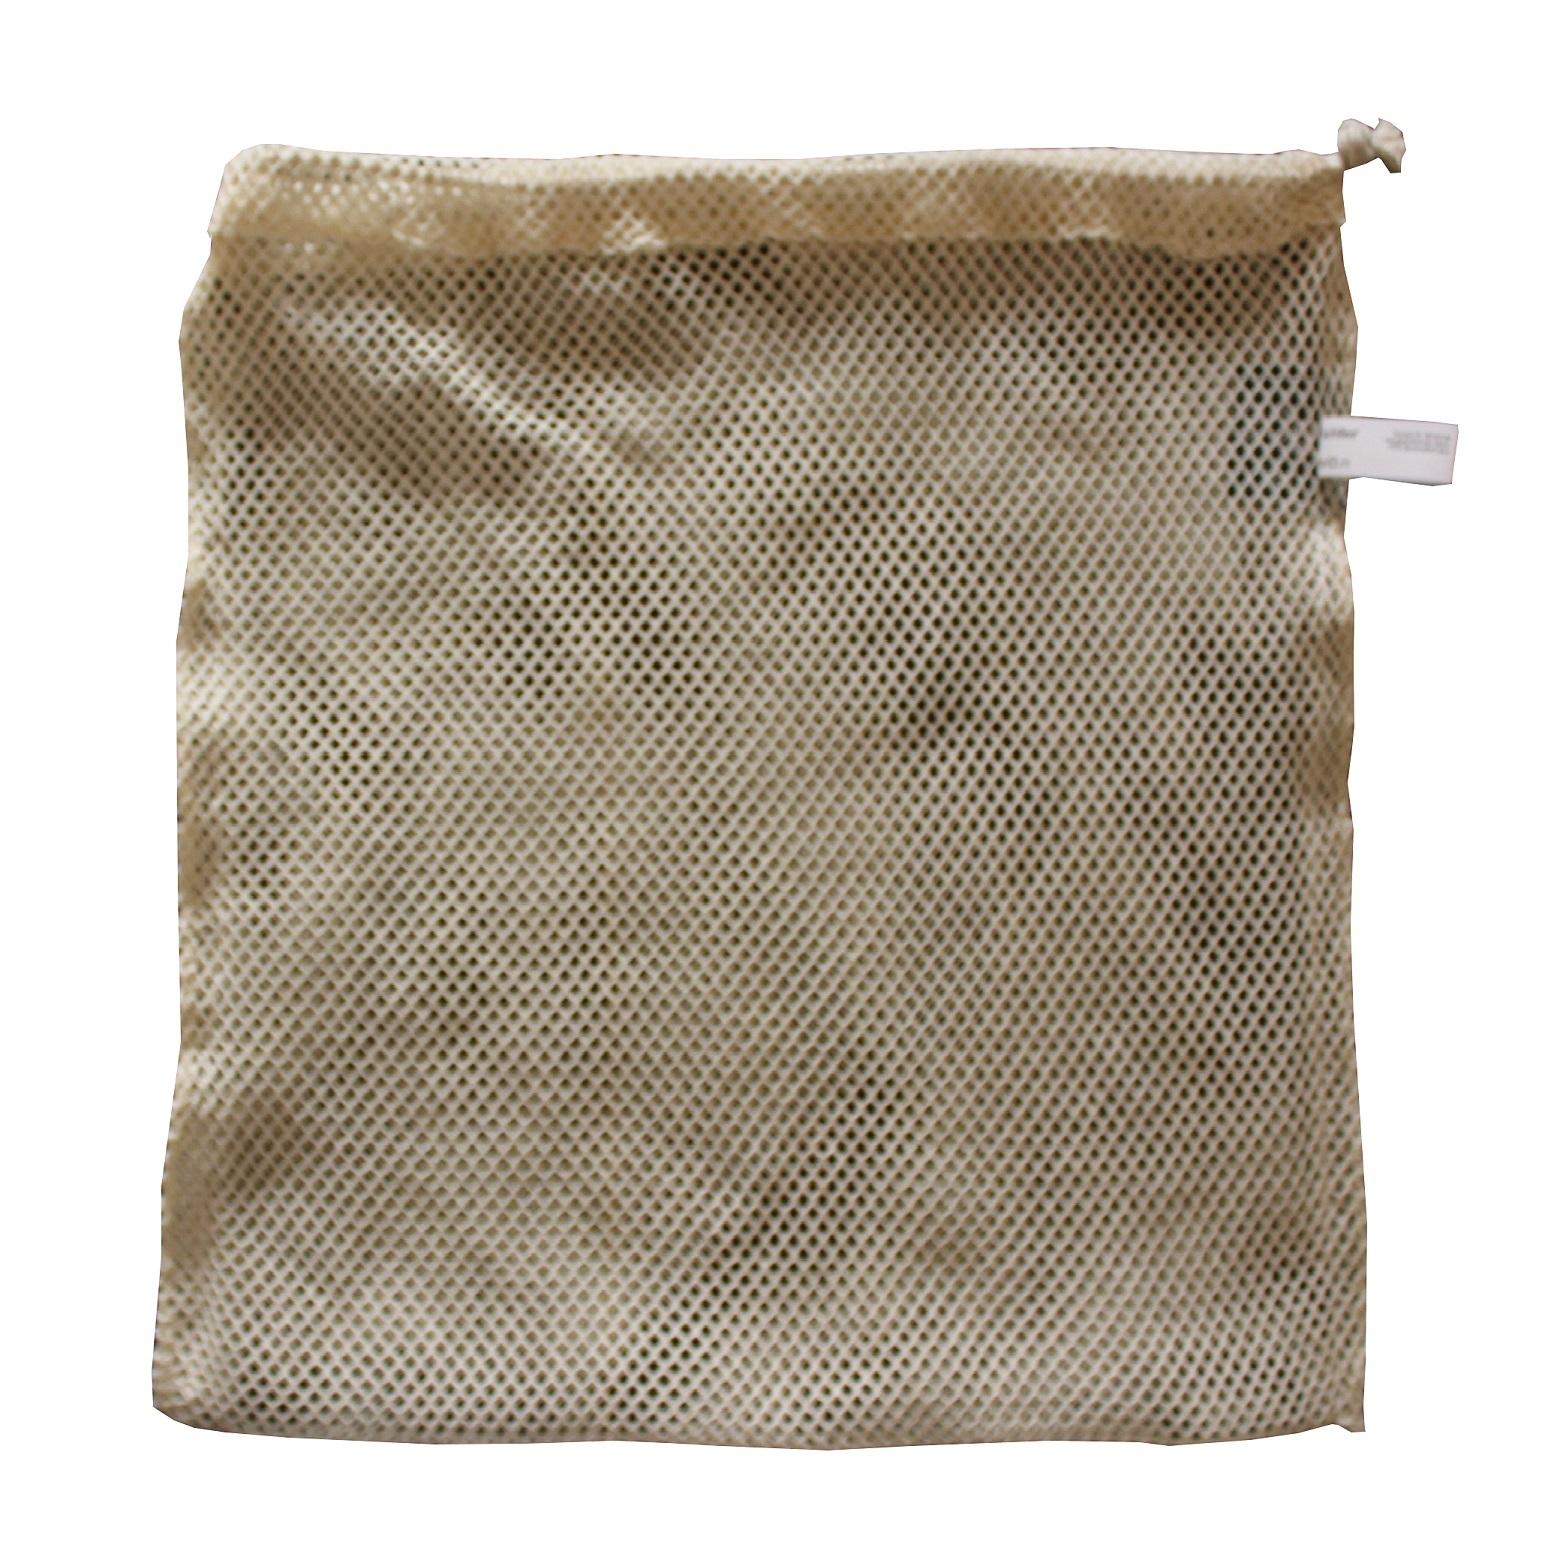 Grocery Vegetable & Fruit Packaging Cotton Mesh Bag